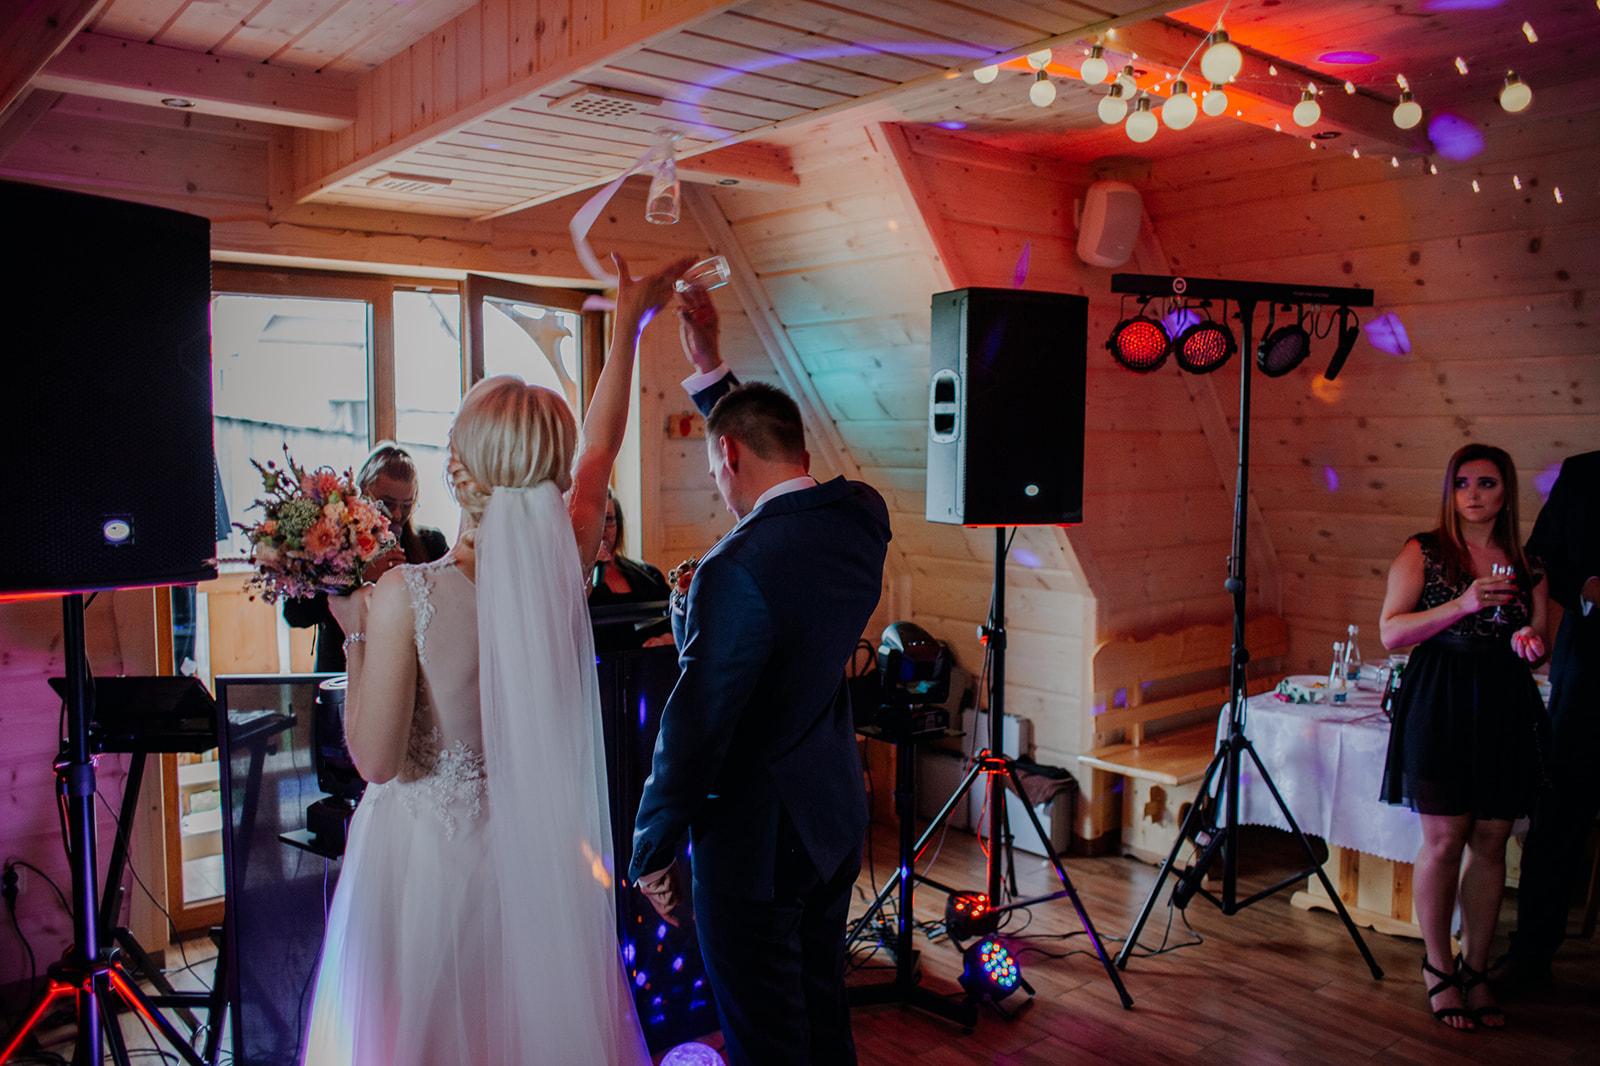 wesele karczma zakopane